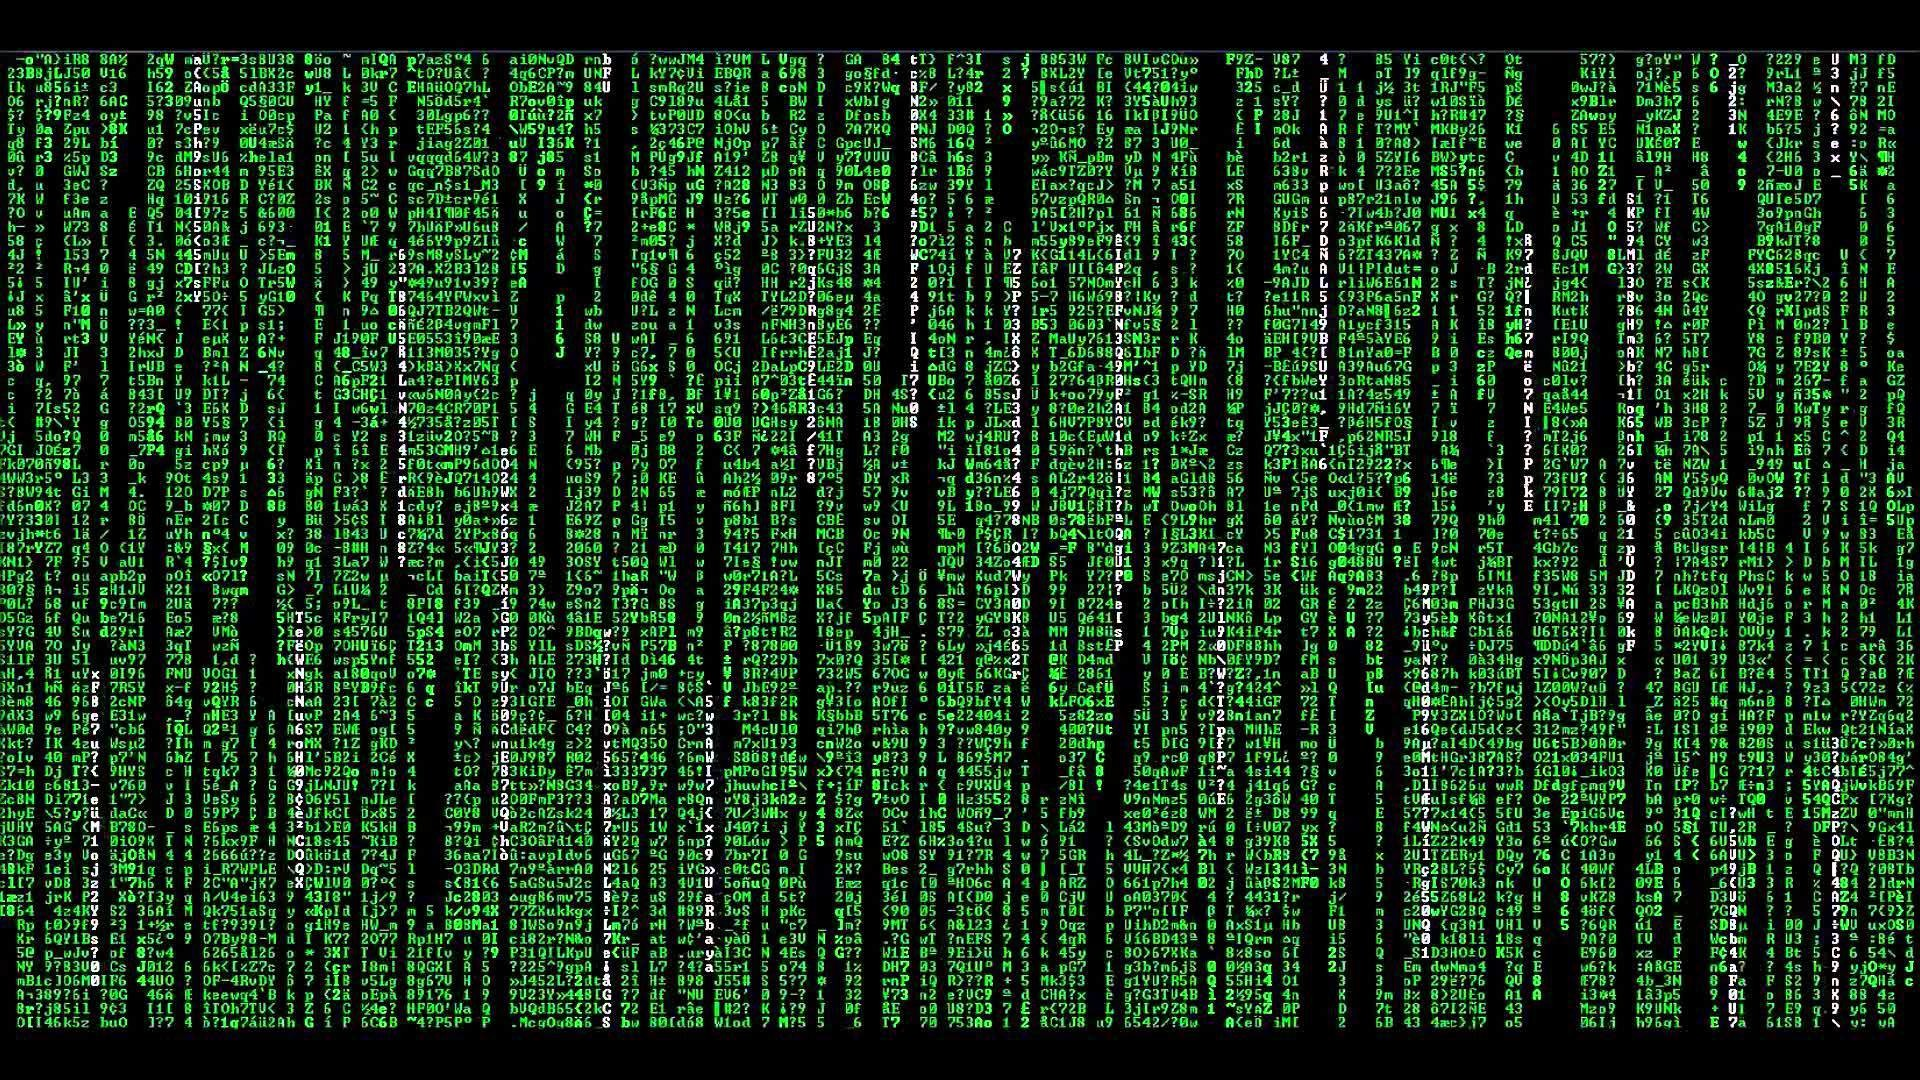 1920x1080 remarkable matrix wallpaper for laptop 1920x1080px hd matrix